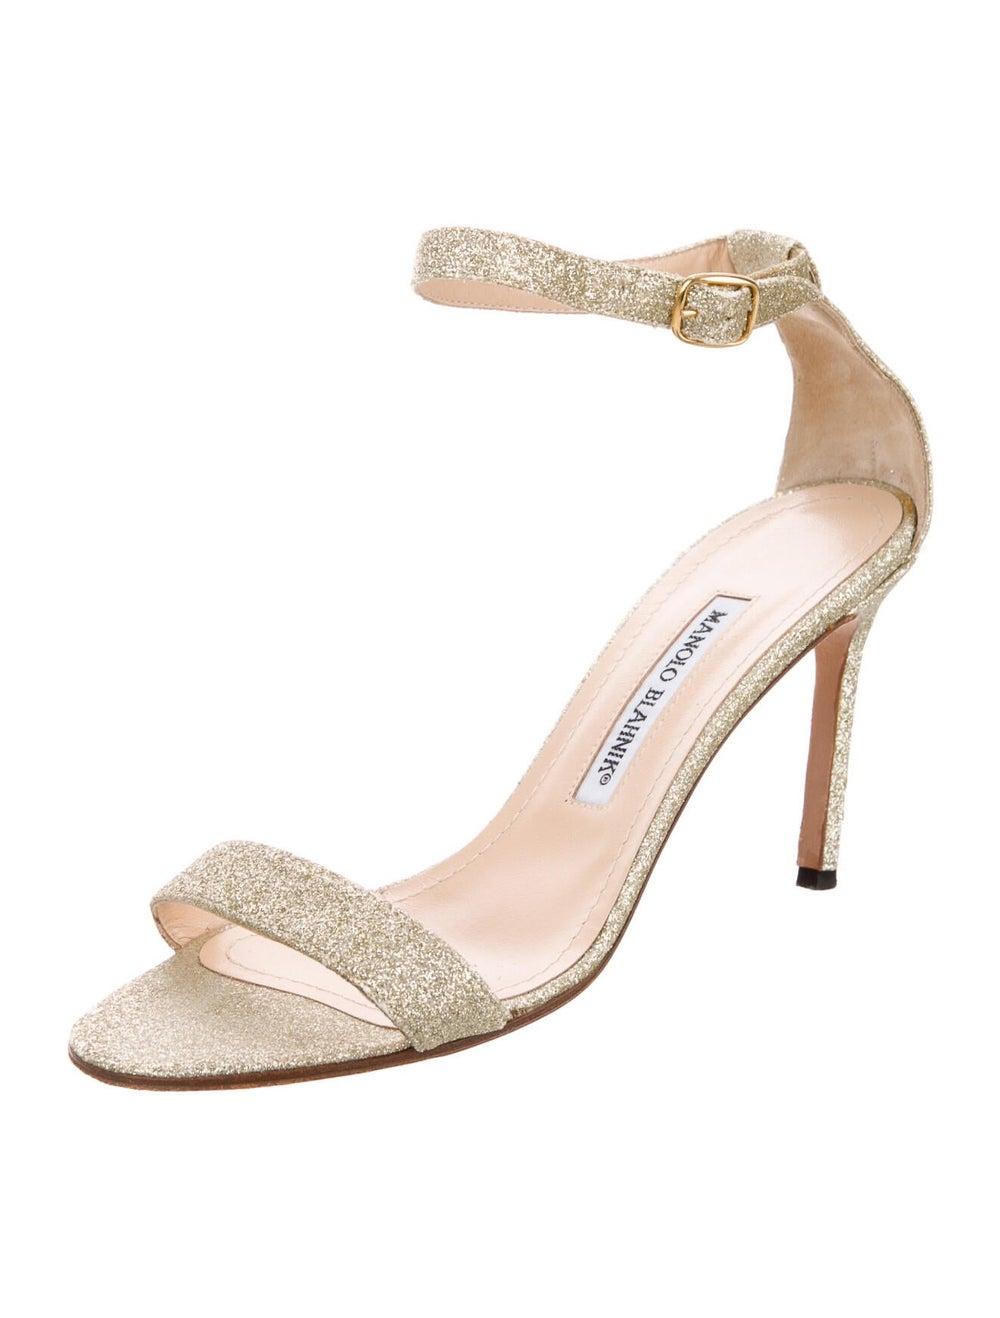 Manolo Blahnik Sandals Gold - image 2